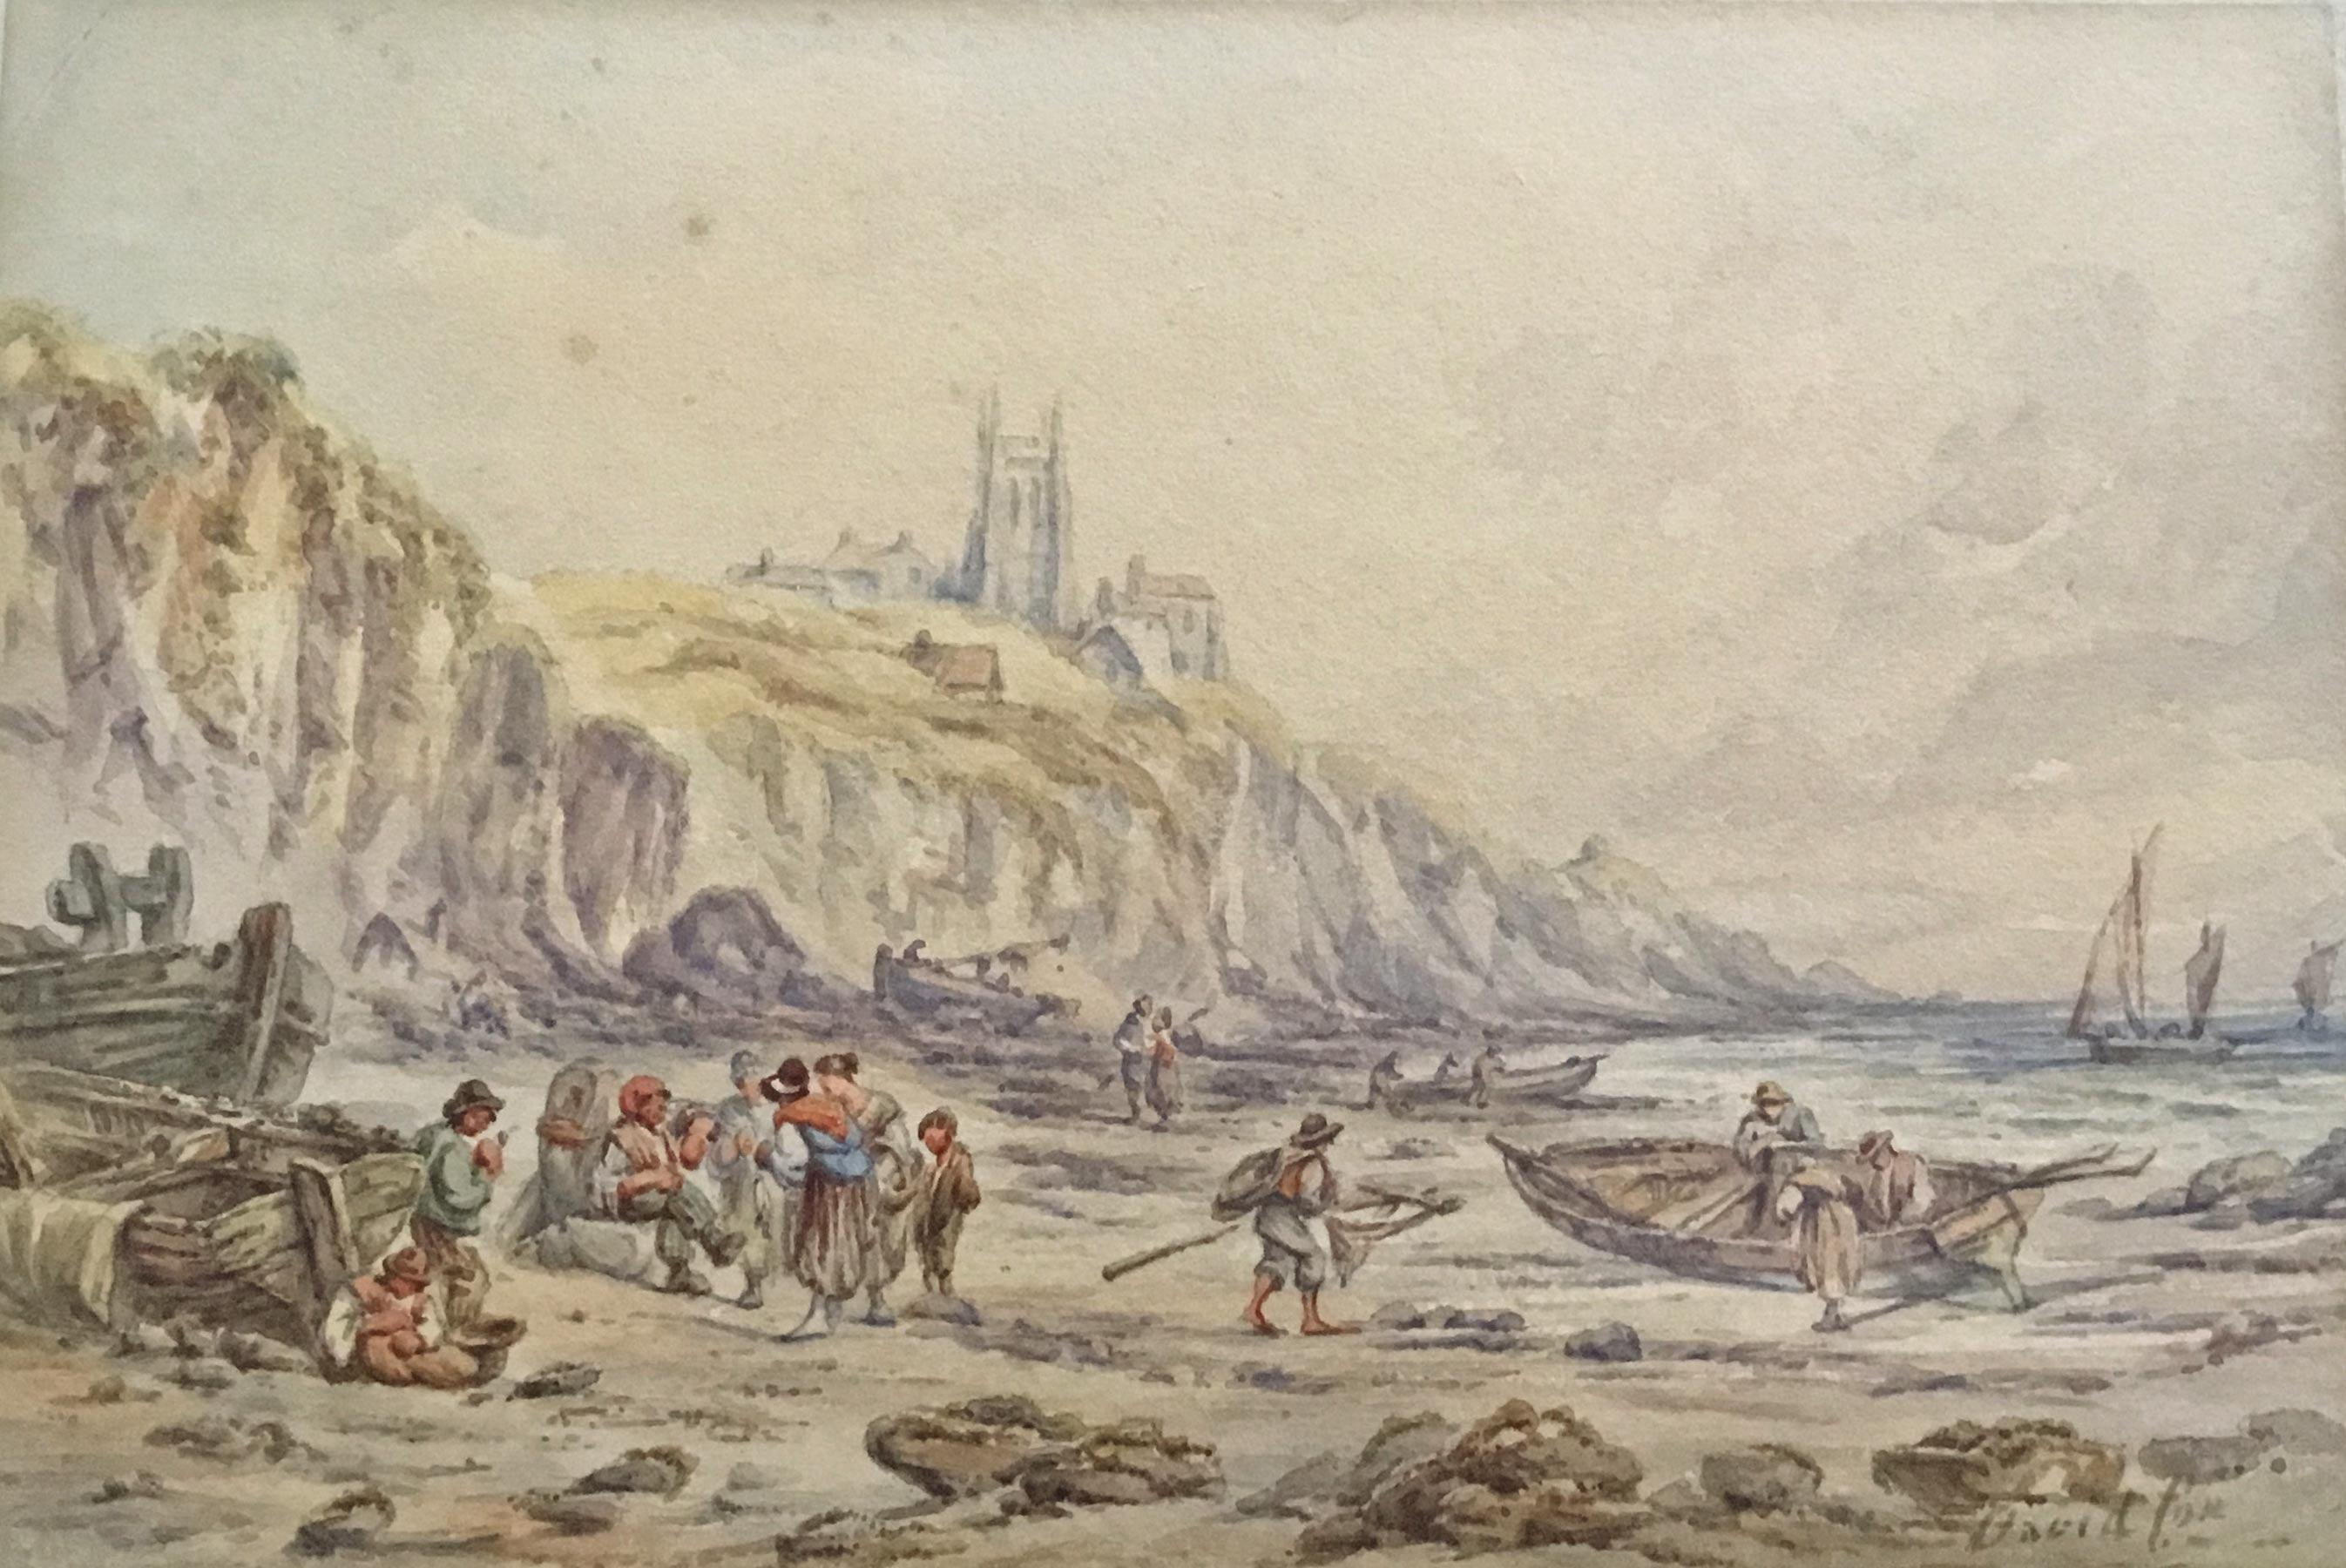 DAVID COX SENIOR (1783 - 1859)